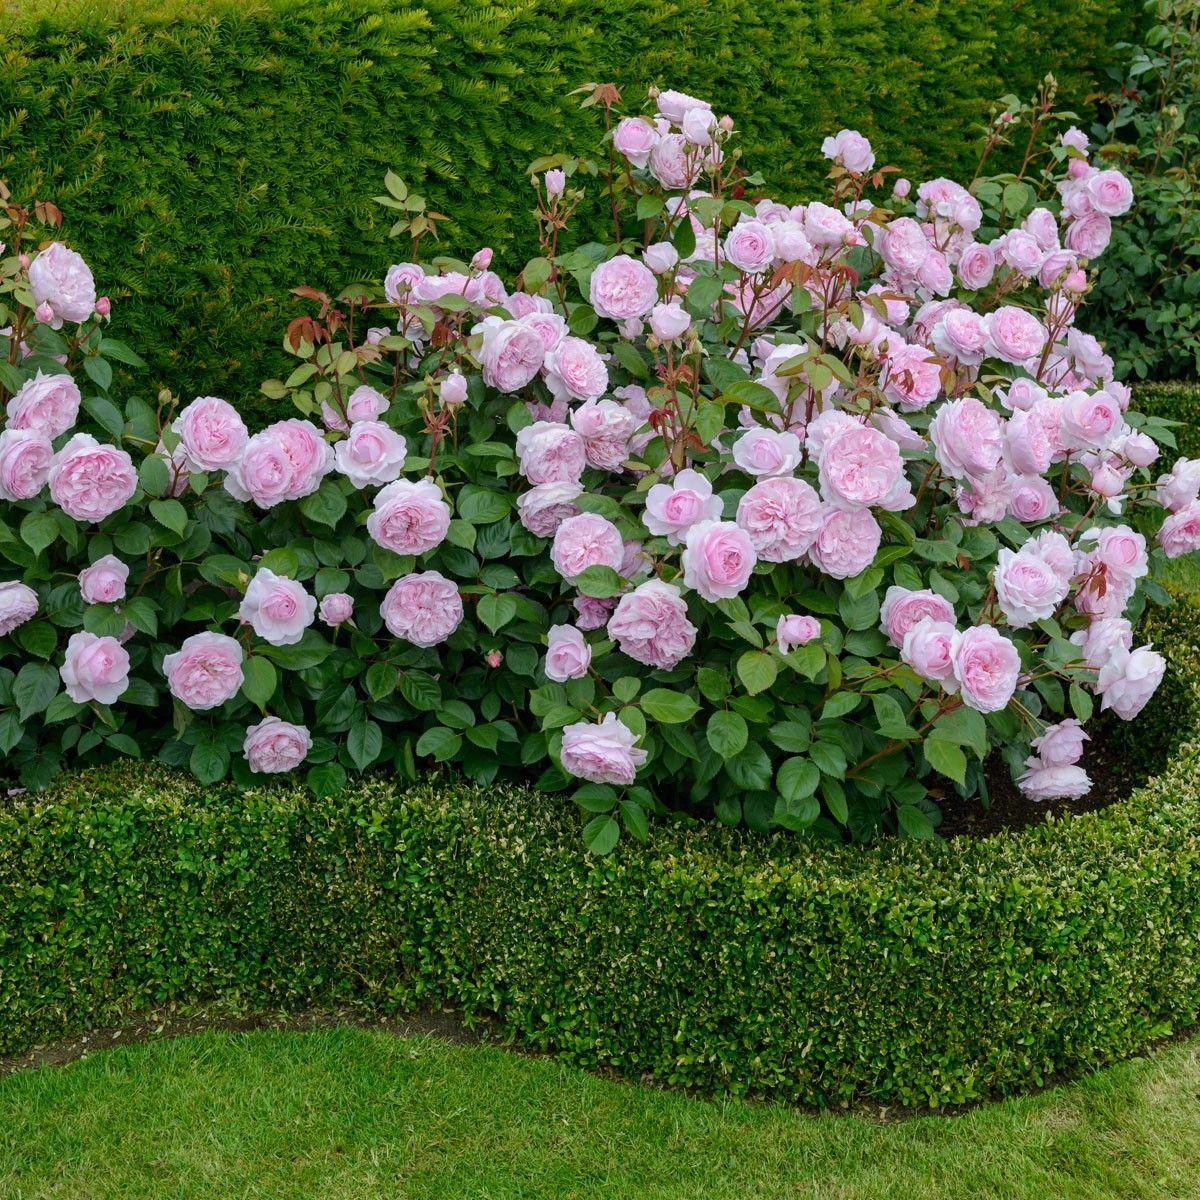 english rose  u0026 39 olivia rose austin u0026 39